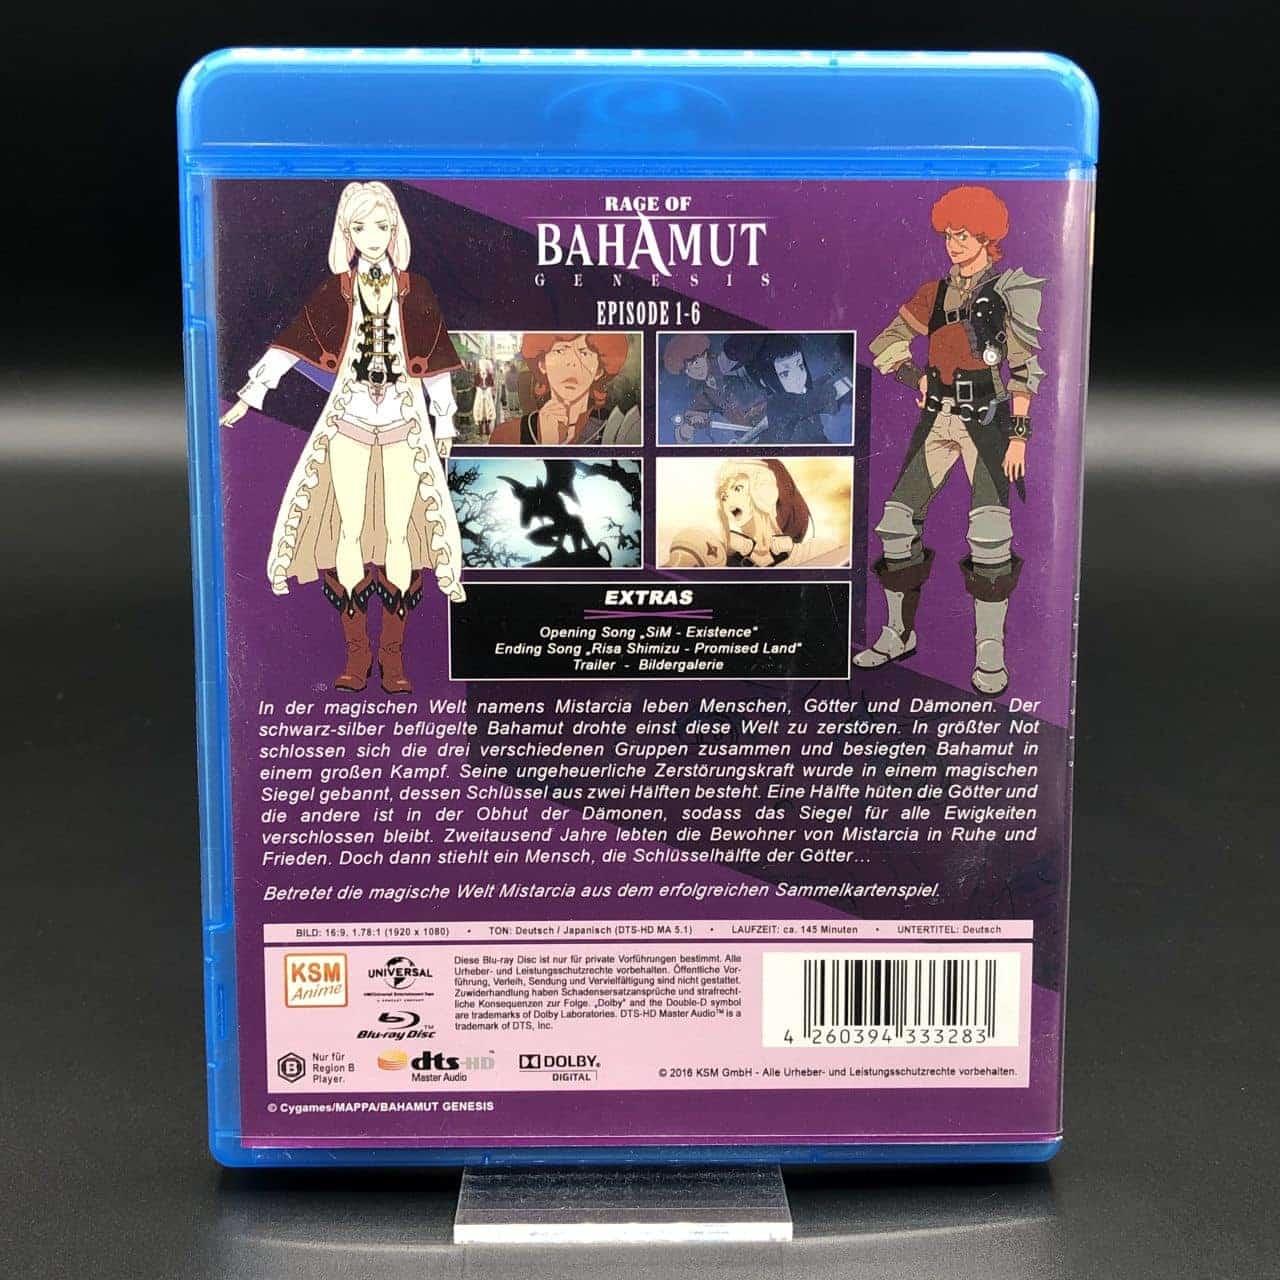 Rage of Bahamut Genesis 1 (Blu-Ray) (Sehr gut) Anime